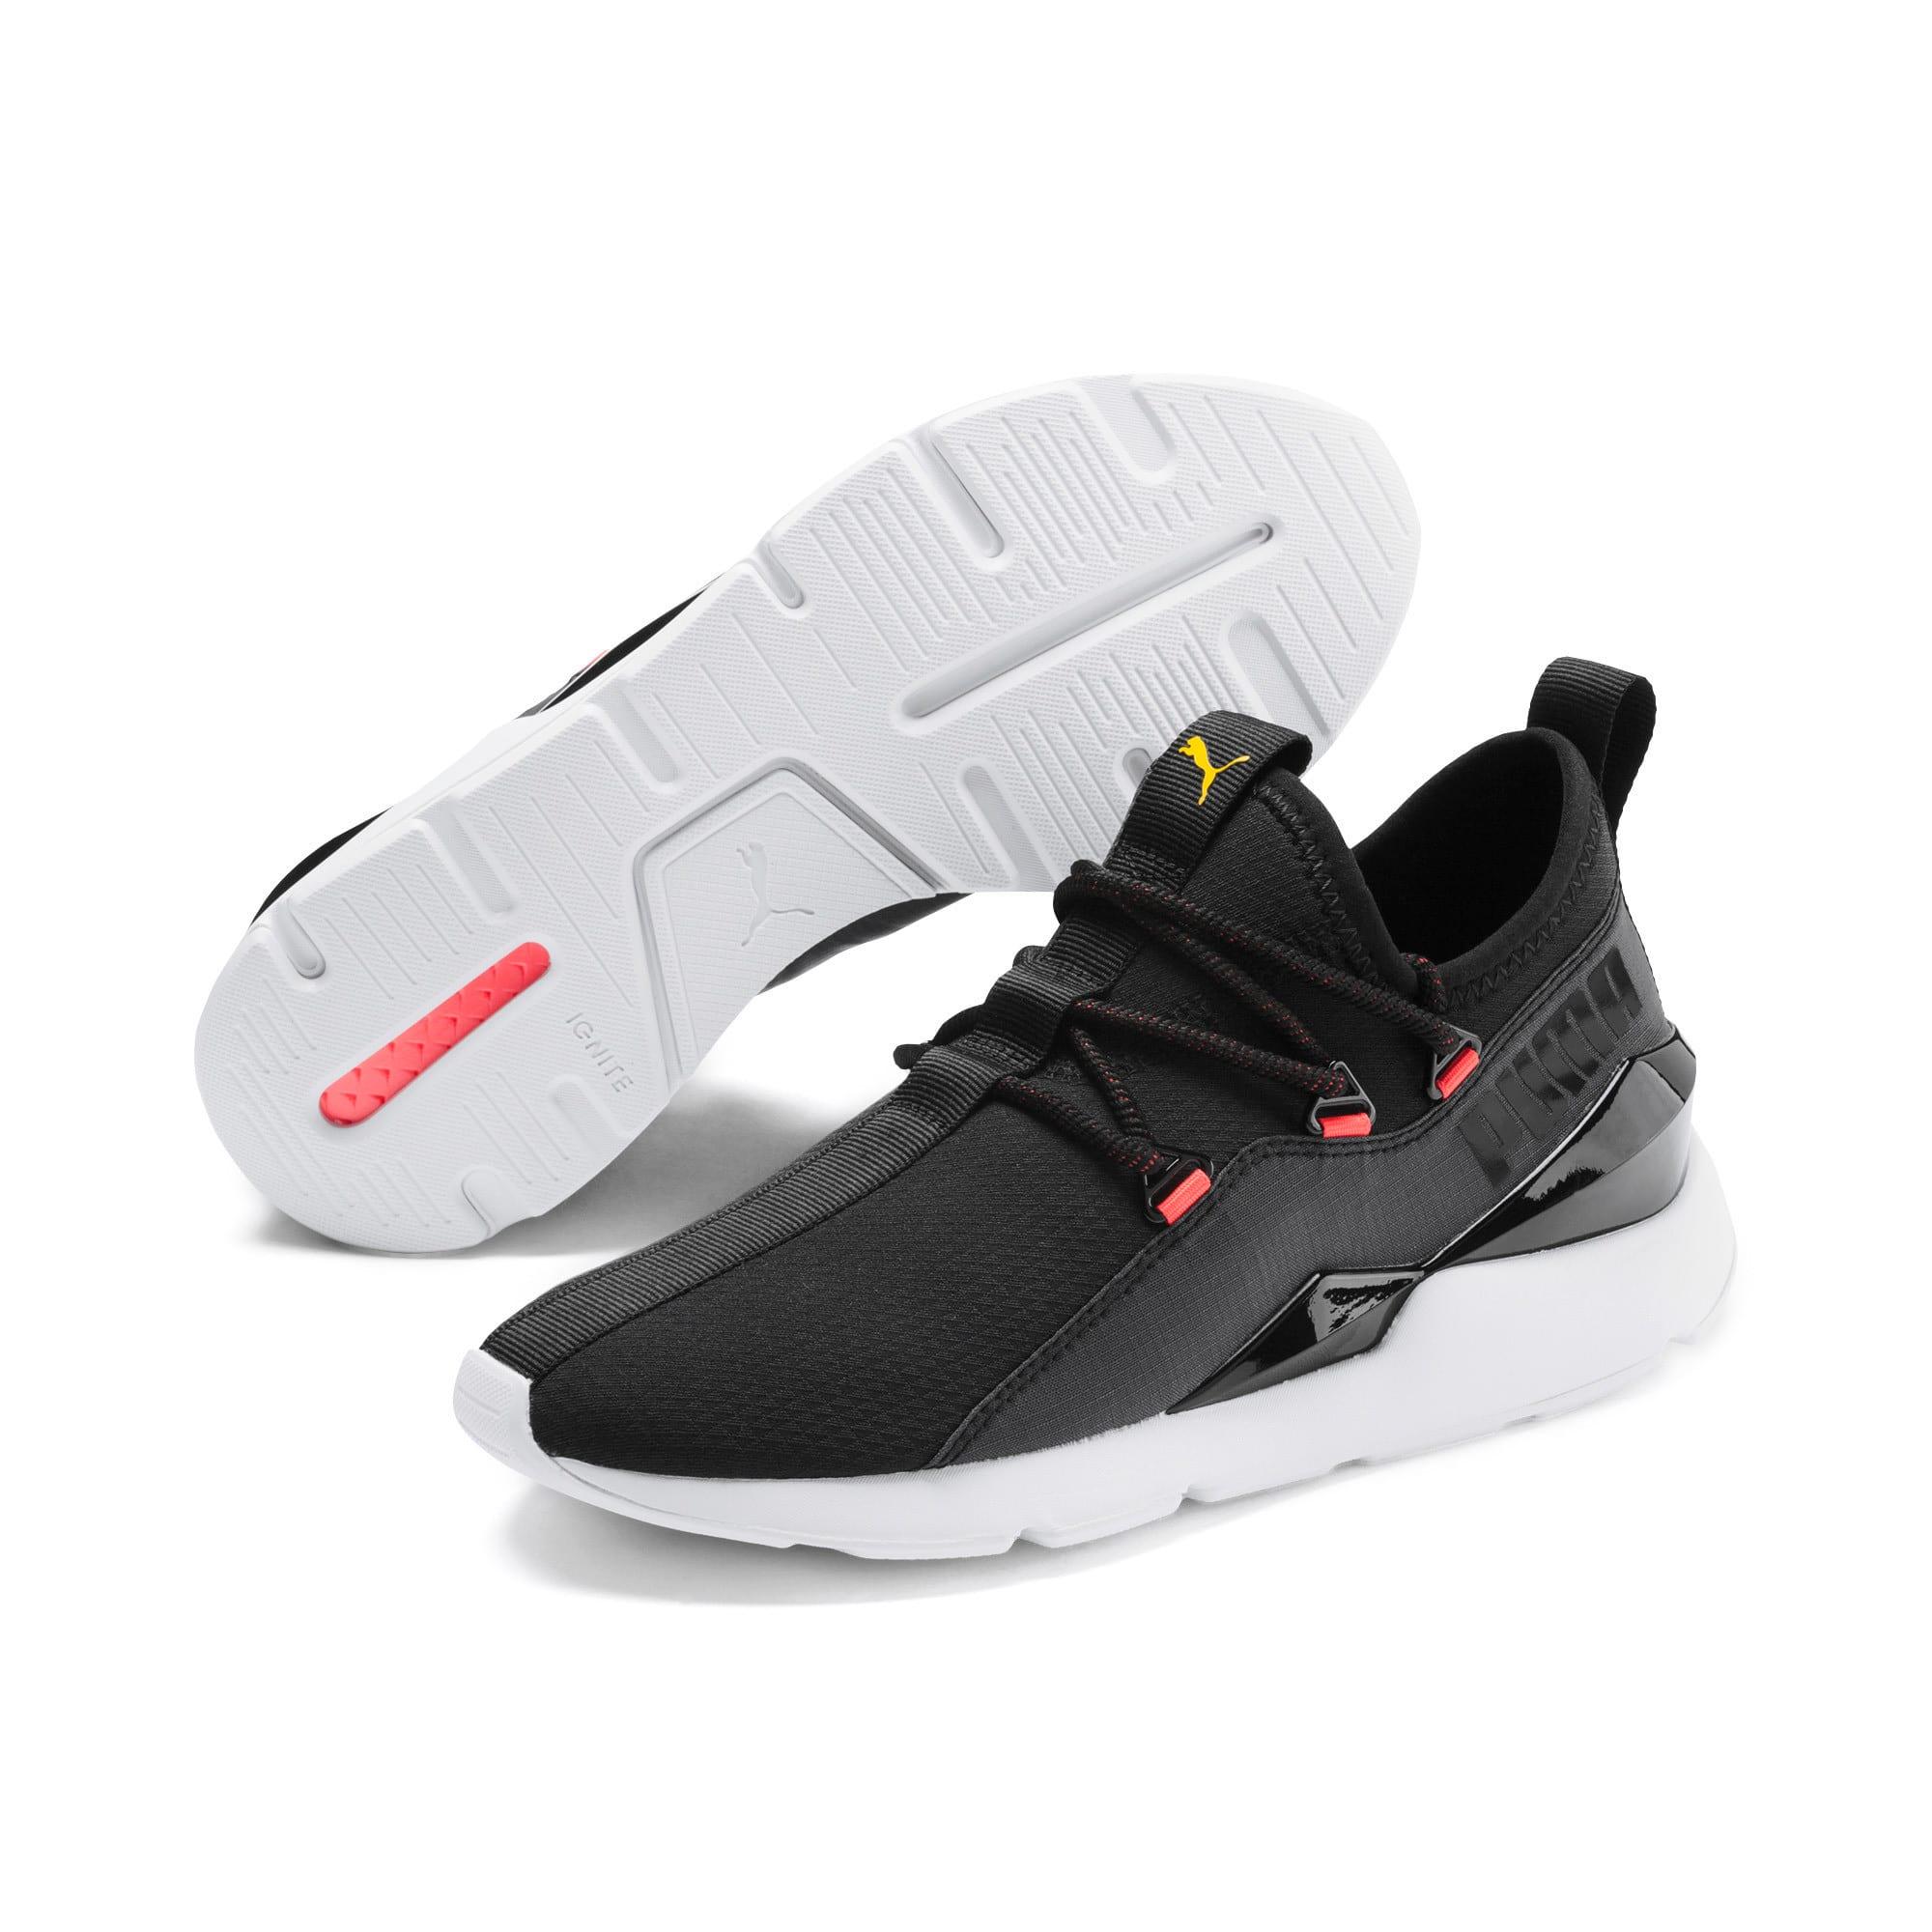 Thumbnail 3 of Muse 2 Hypertech Women's Sneakers, Puma Black-Sulphur, medium